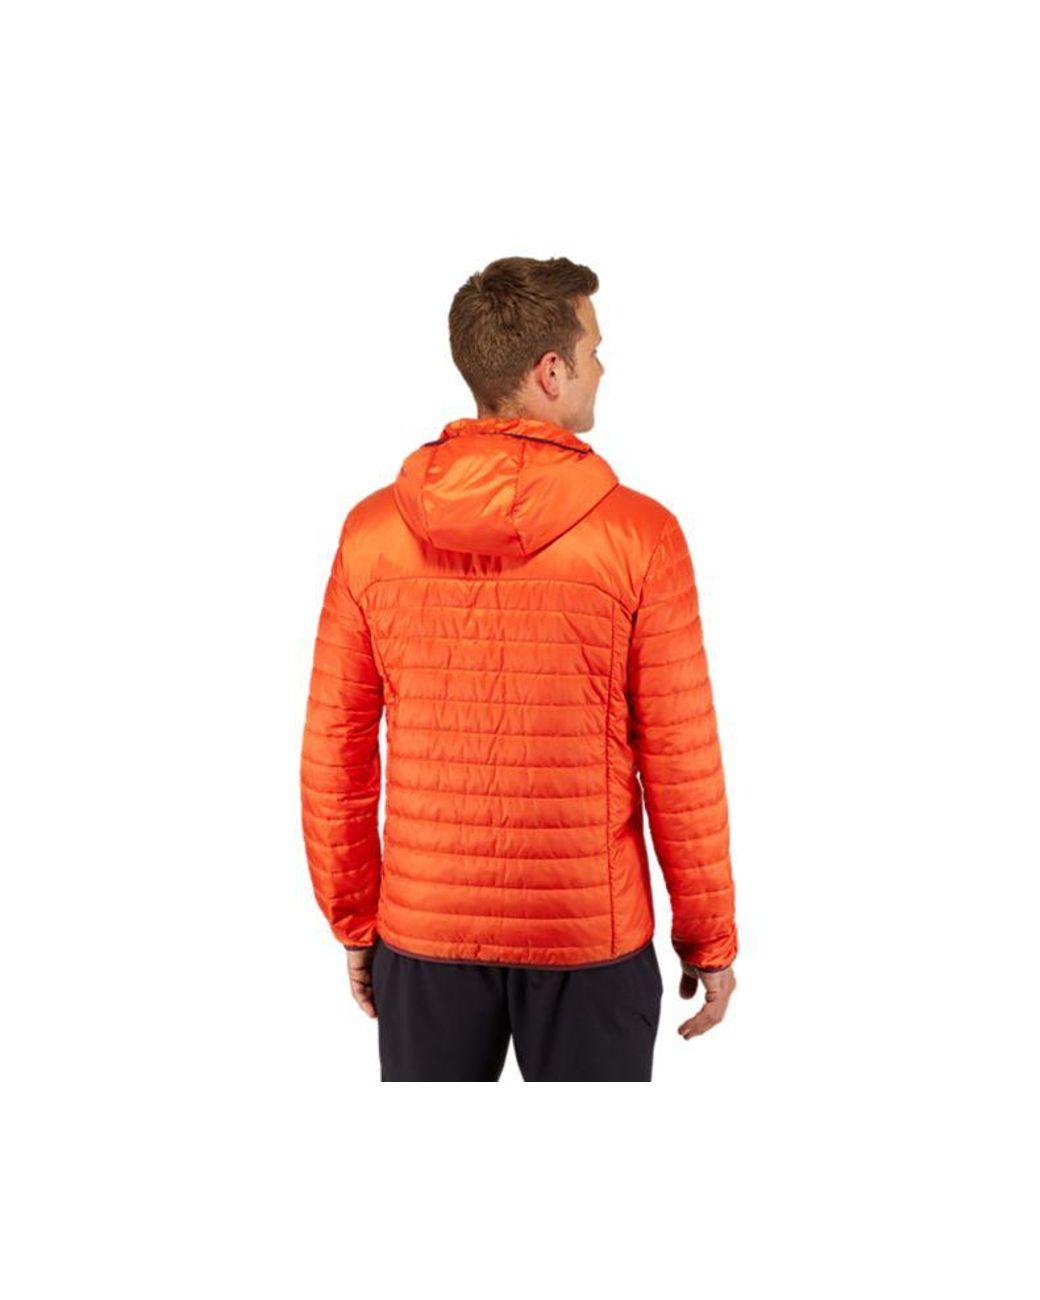 e742eb2cf Merrell Entrada Insulated Hoody in Orange for Men - Lyst